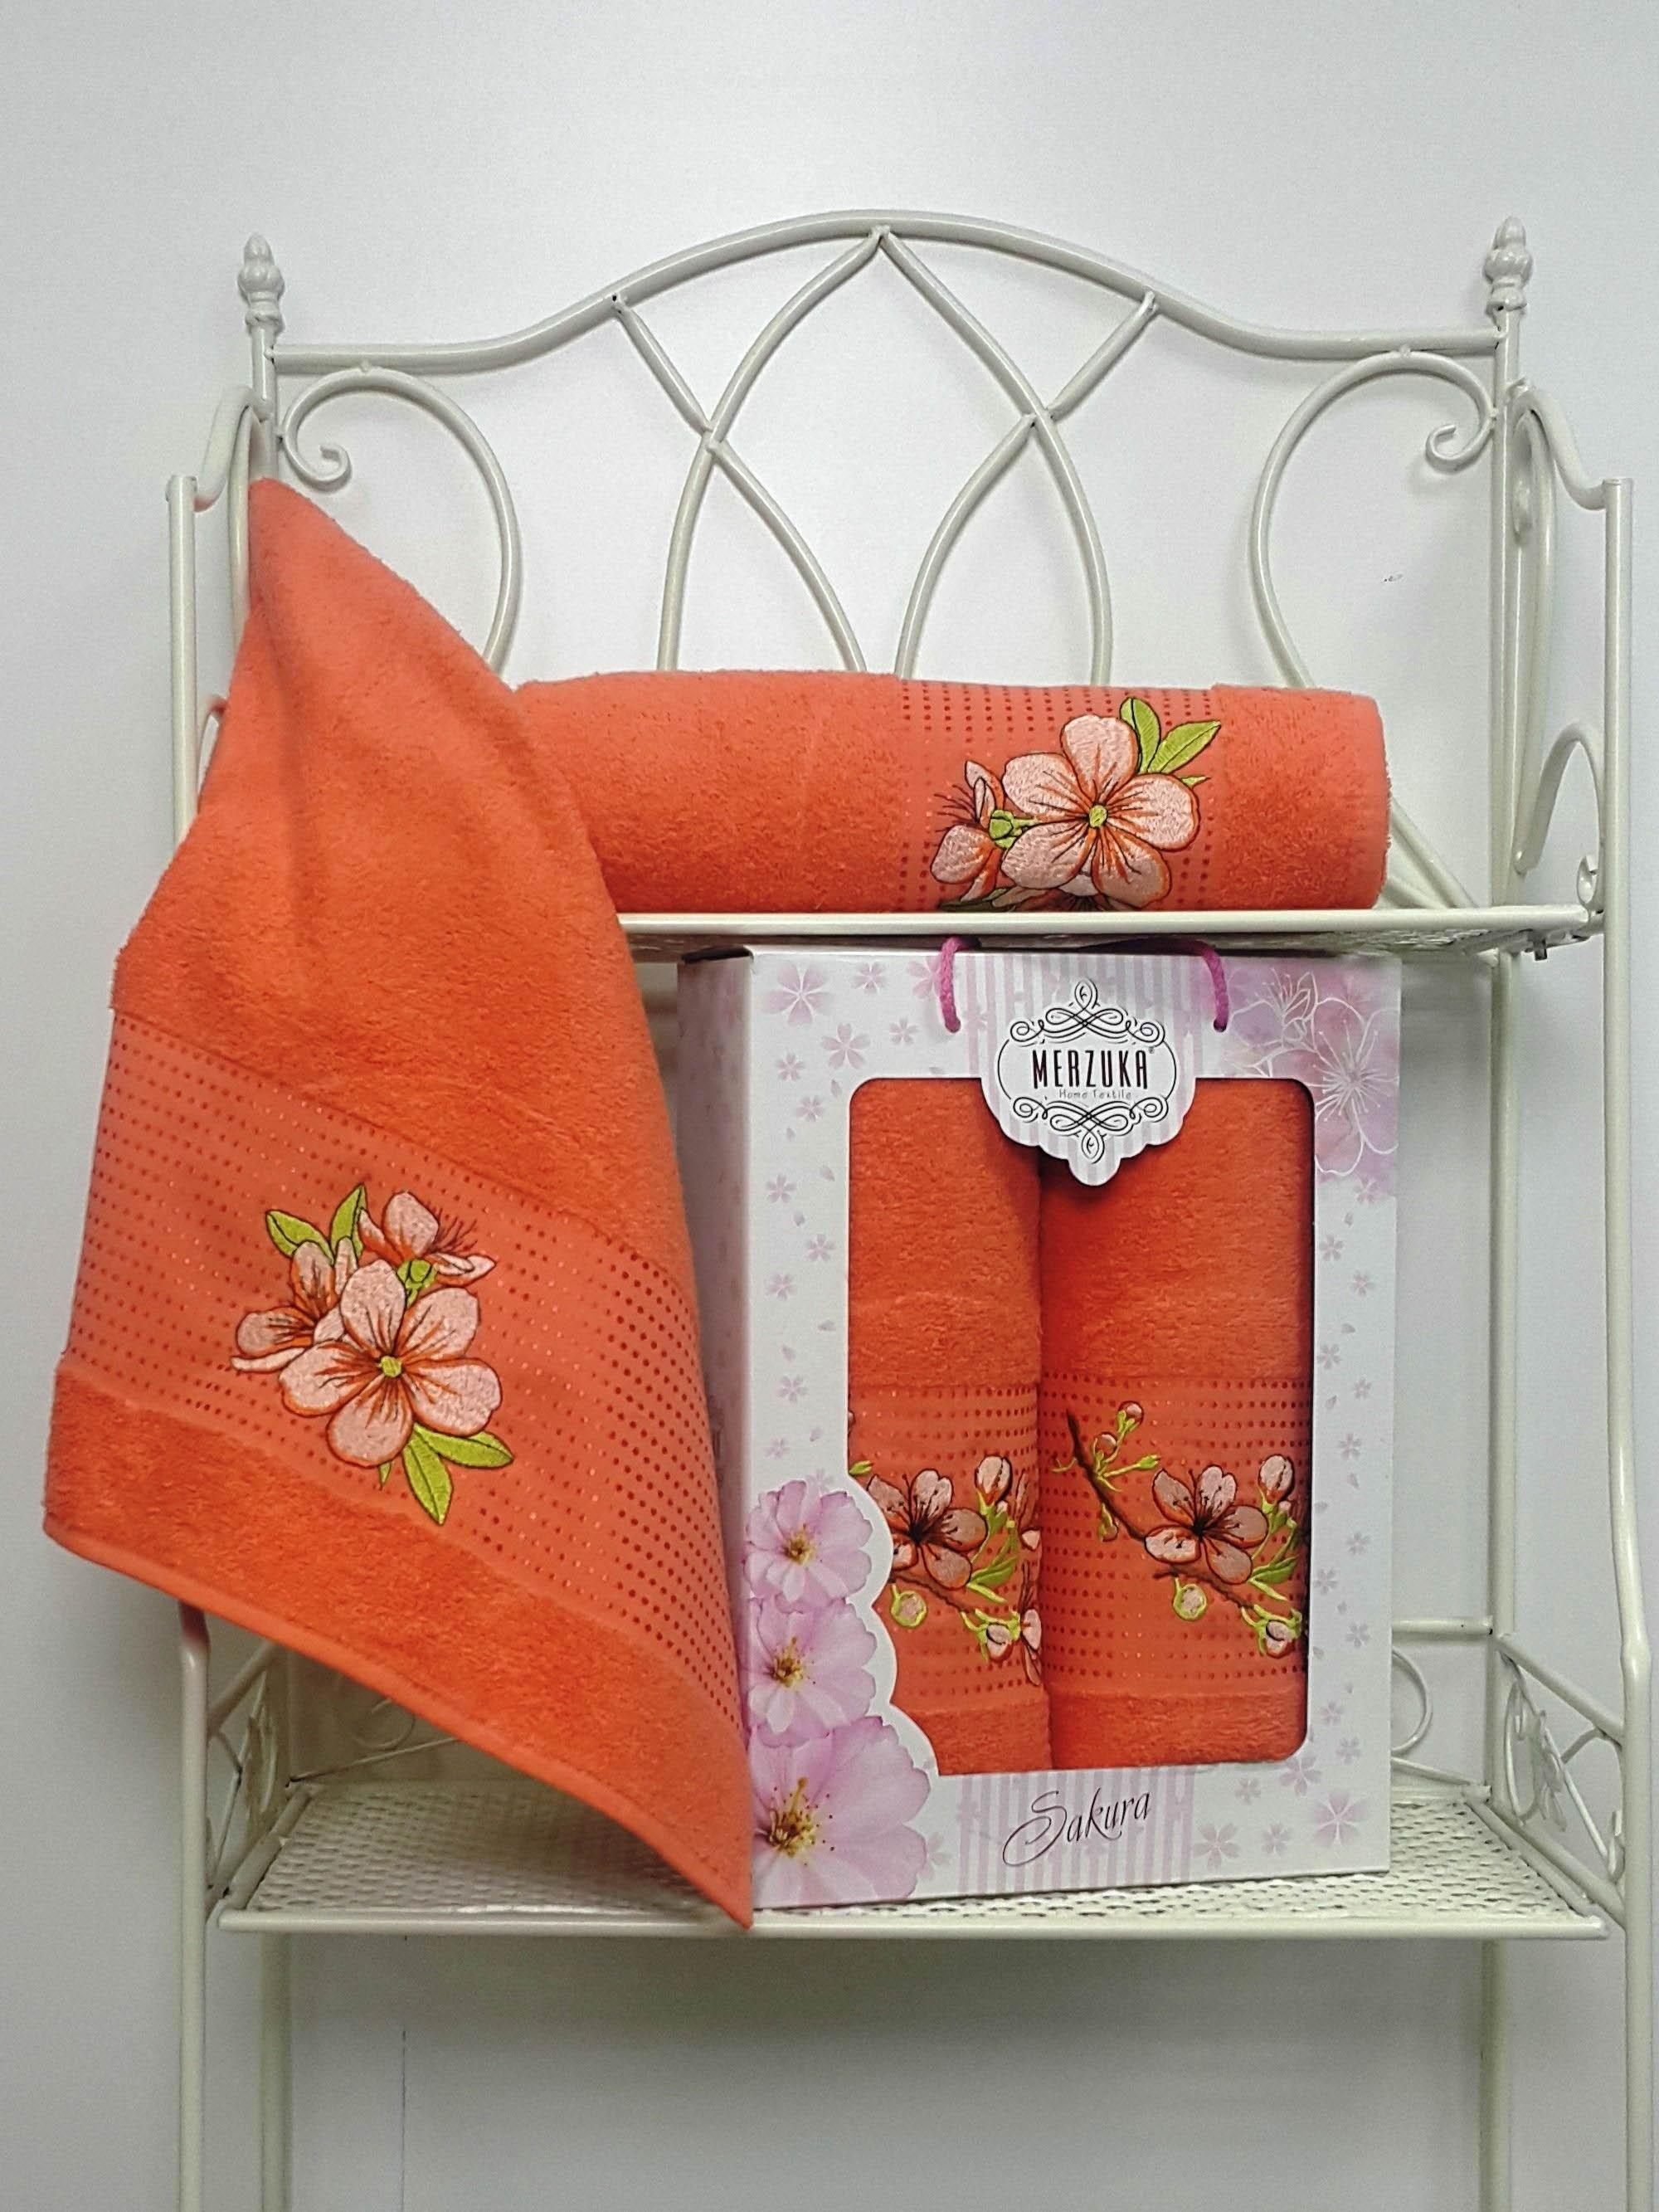 Полотенца Oran Merzuka Полотенце Sakura Цвет: Оранжевый (Набор) набор из 3 полотенец merzuka sakura 50х90 2 70х140 8432 терракотовый